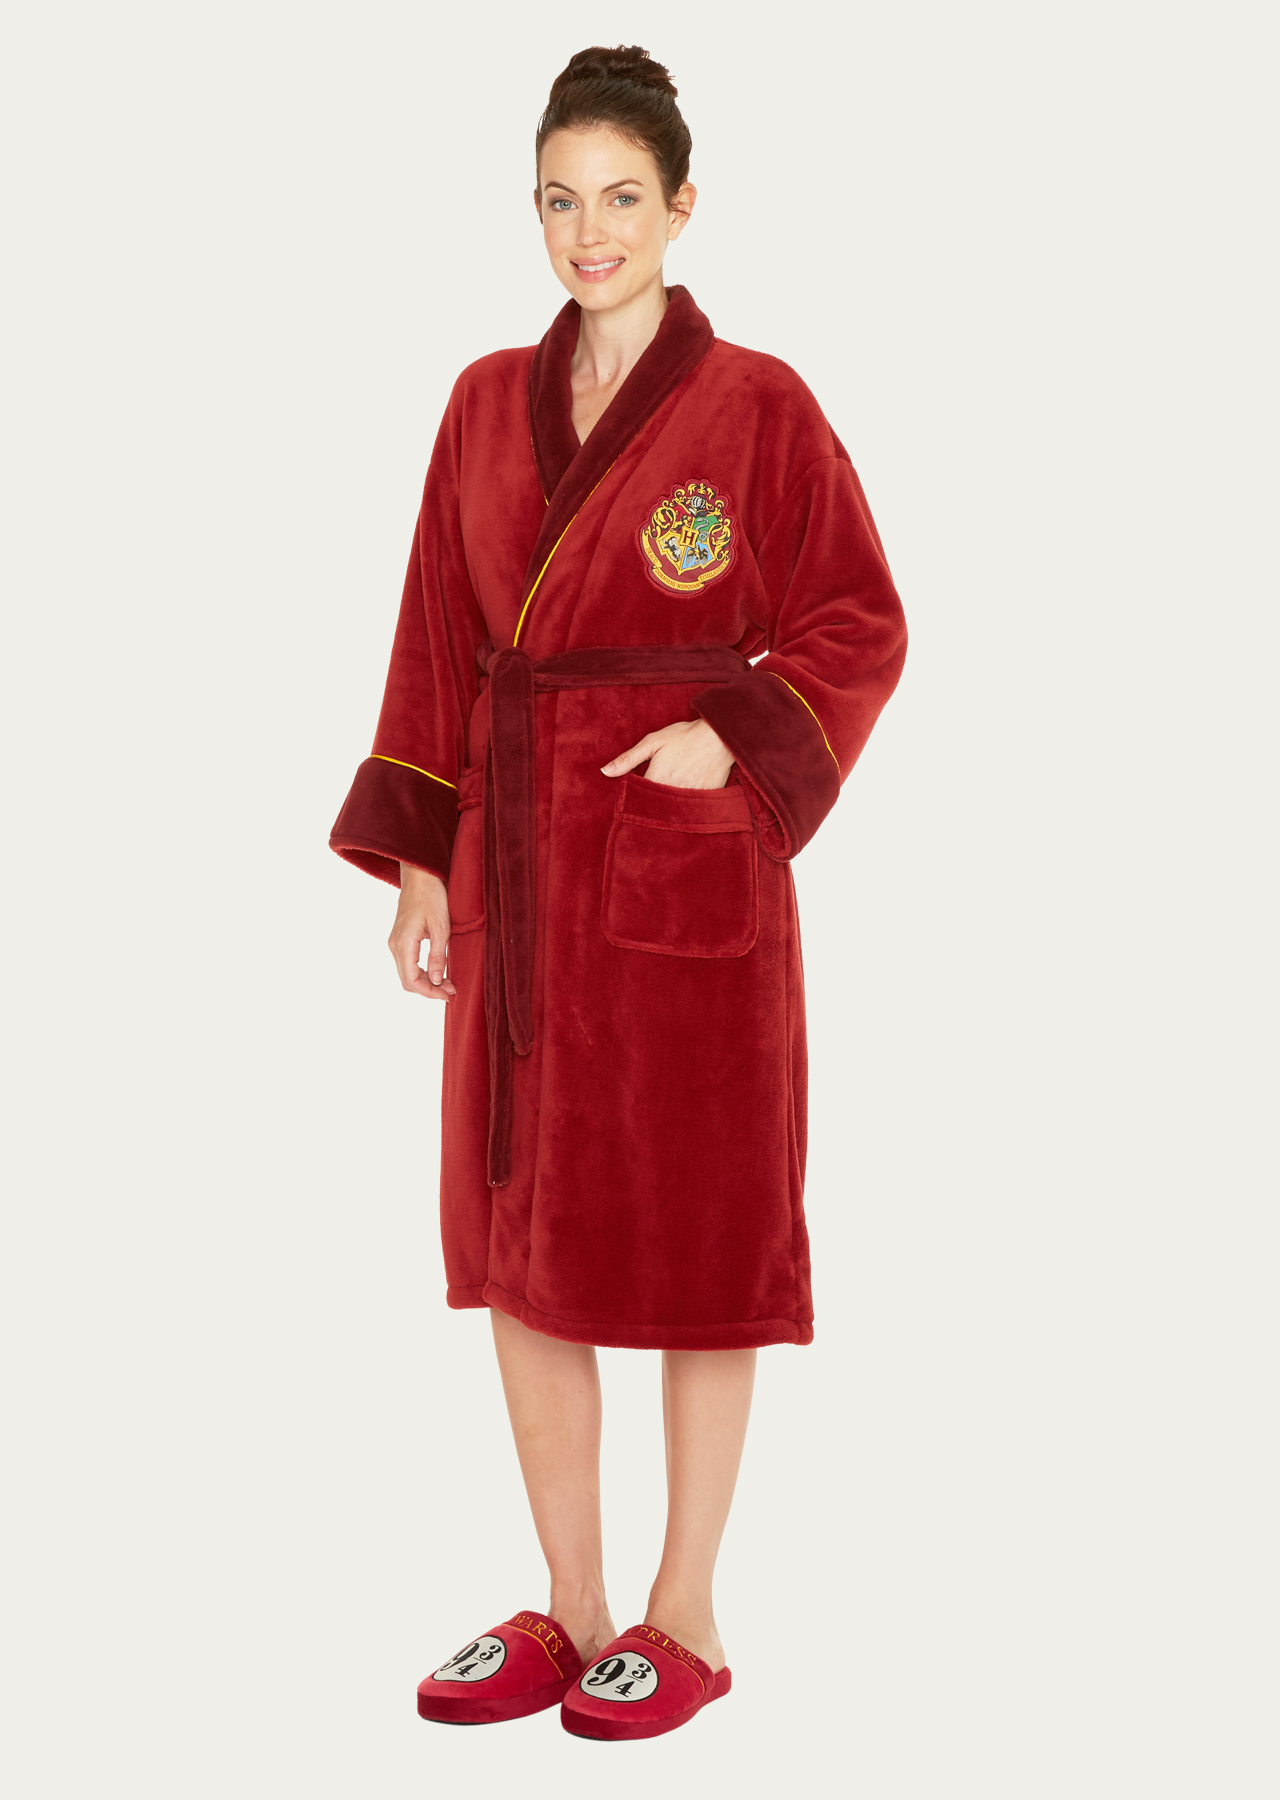 Harry Potter Hogwarts Express 9 3 4 Womens Fleece Bathrobe – Groovy UK 666dc29b6b